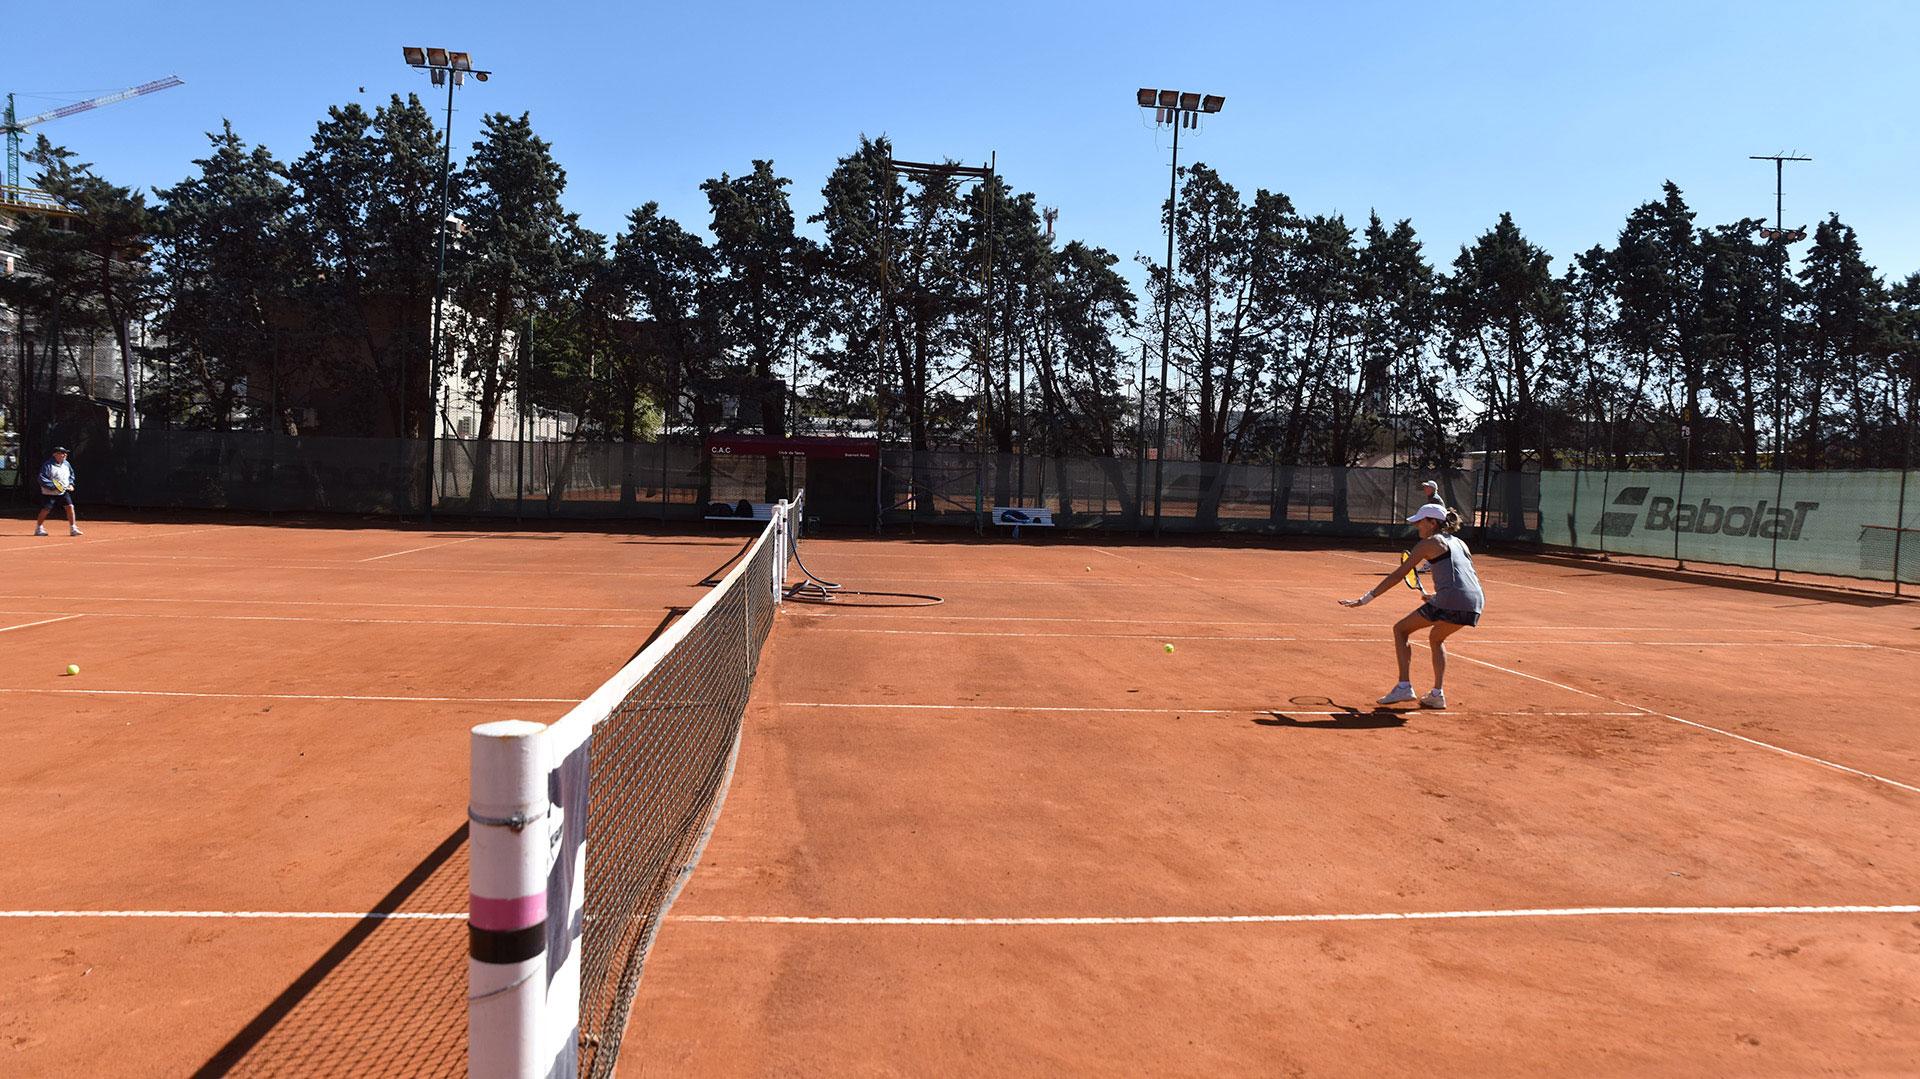 La jornada de sol acompañó al regreso del tenis